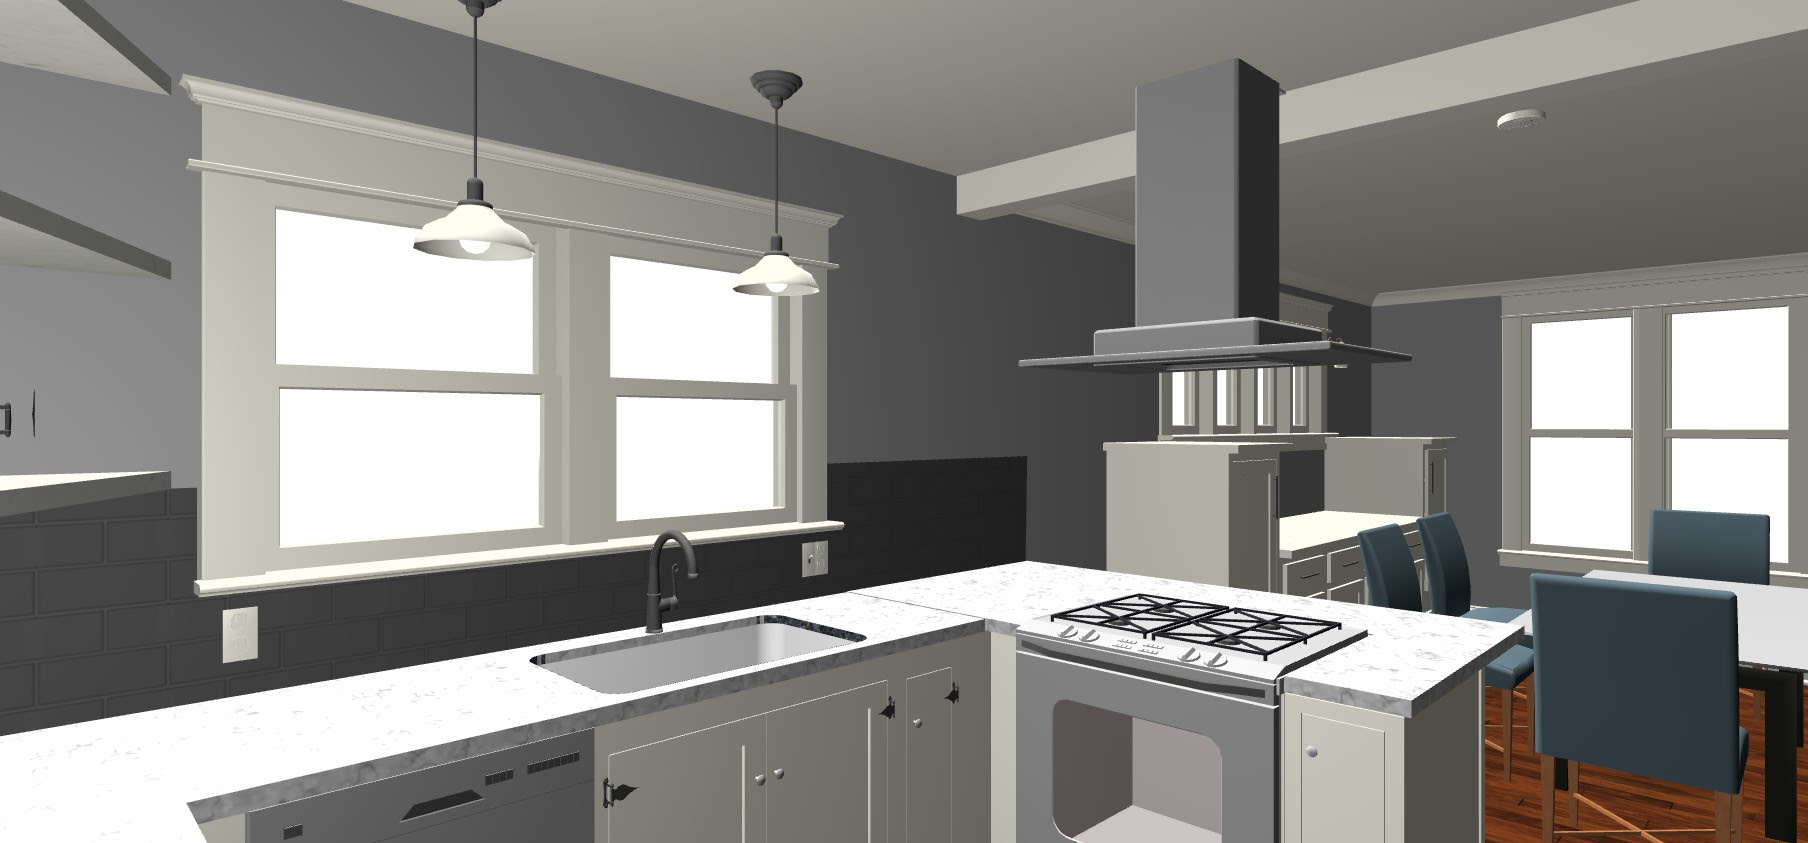 Kitchen Makeover Update: The Devil in the Details | Inside Arciform